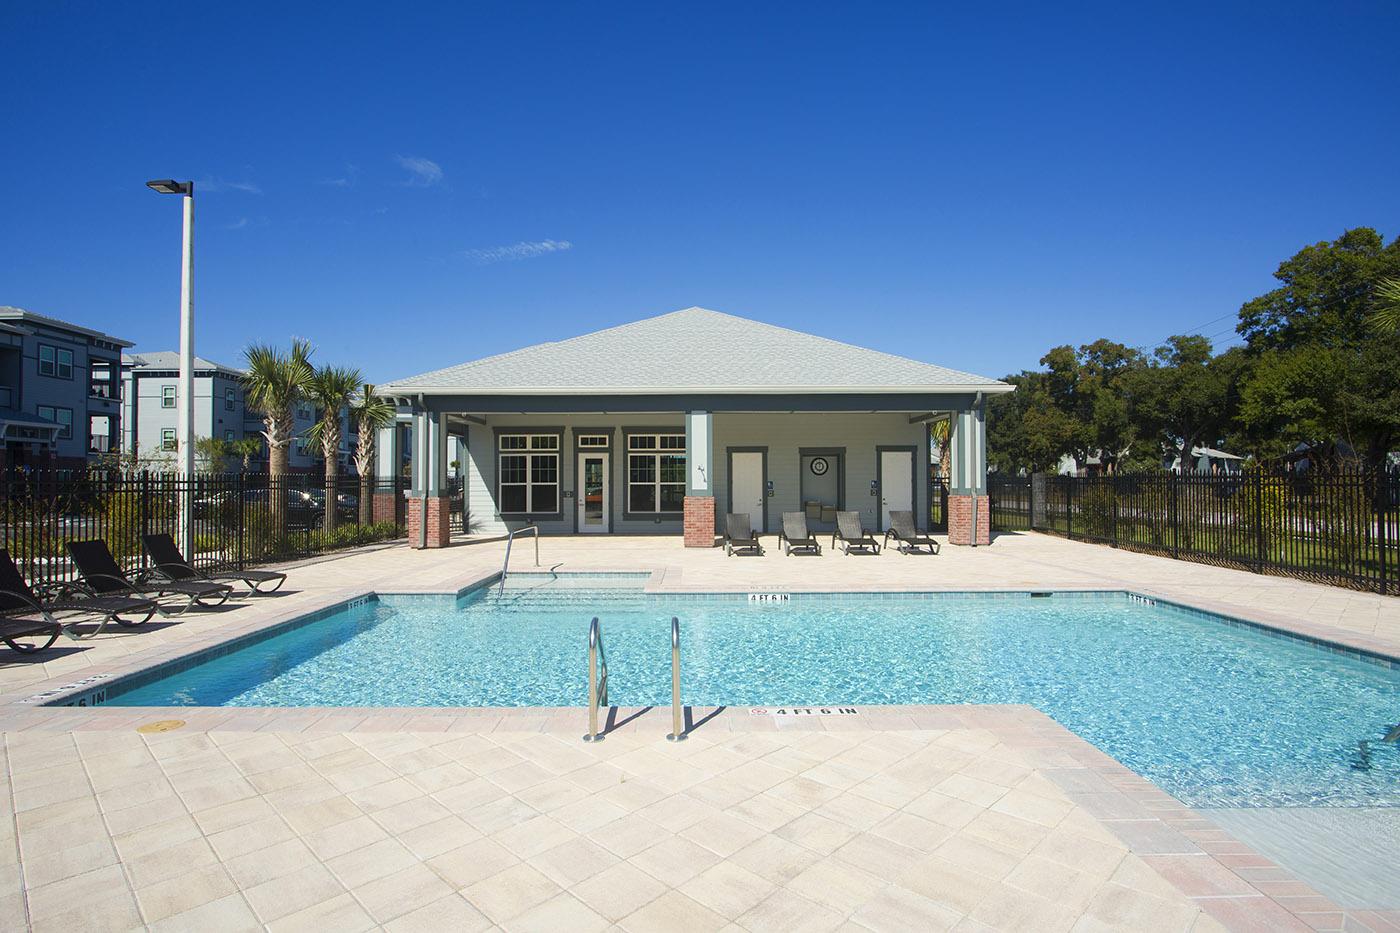 CharlestonEdge-Rental-Apartment-Brandon-Tampa-Florida-Pool-Bedrooms-Pets-Pool-4.jpg